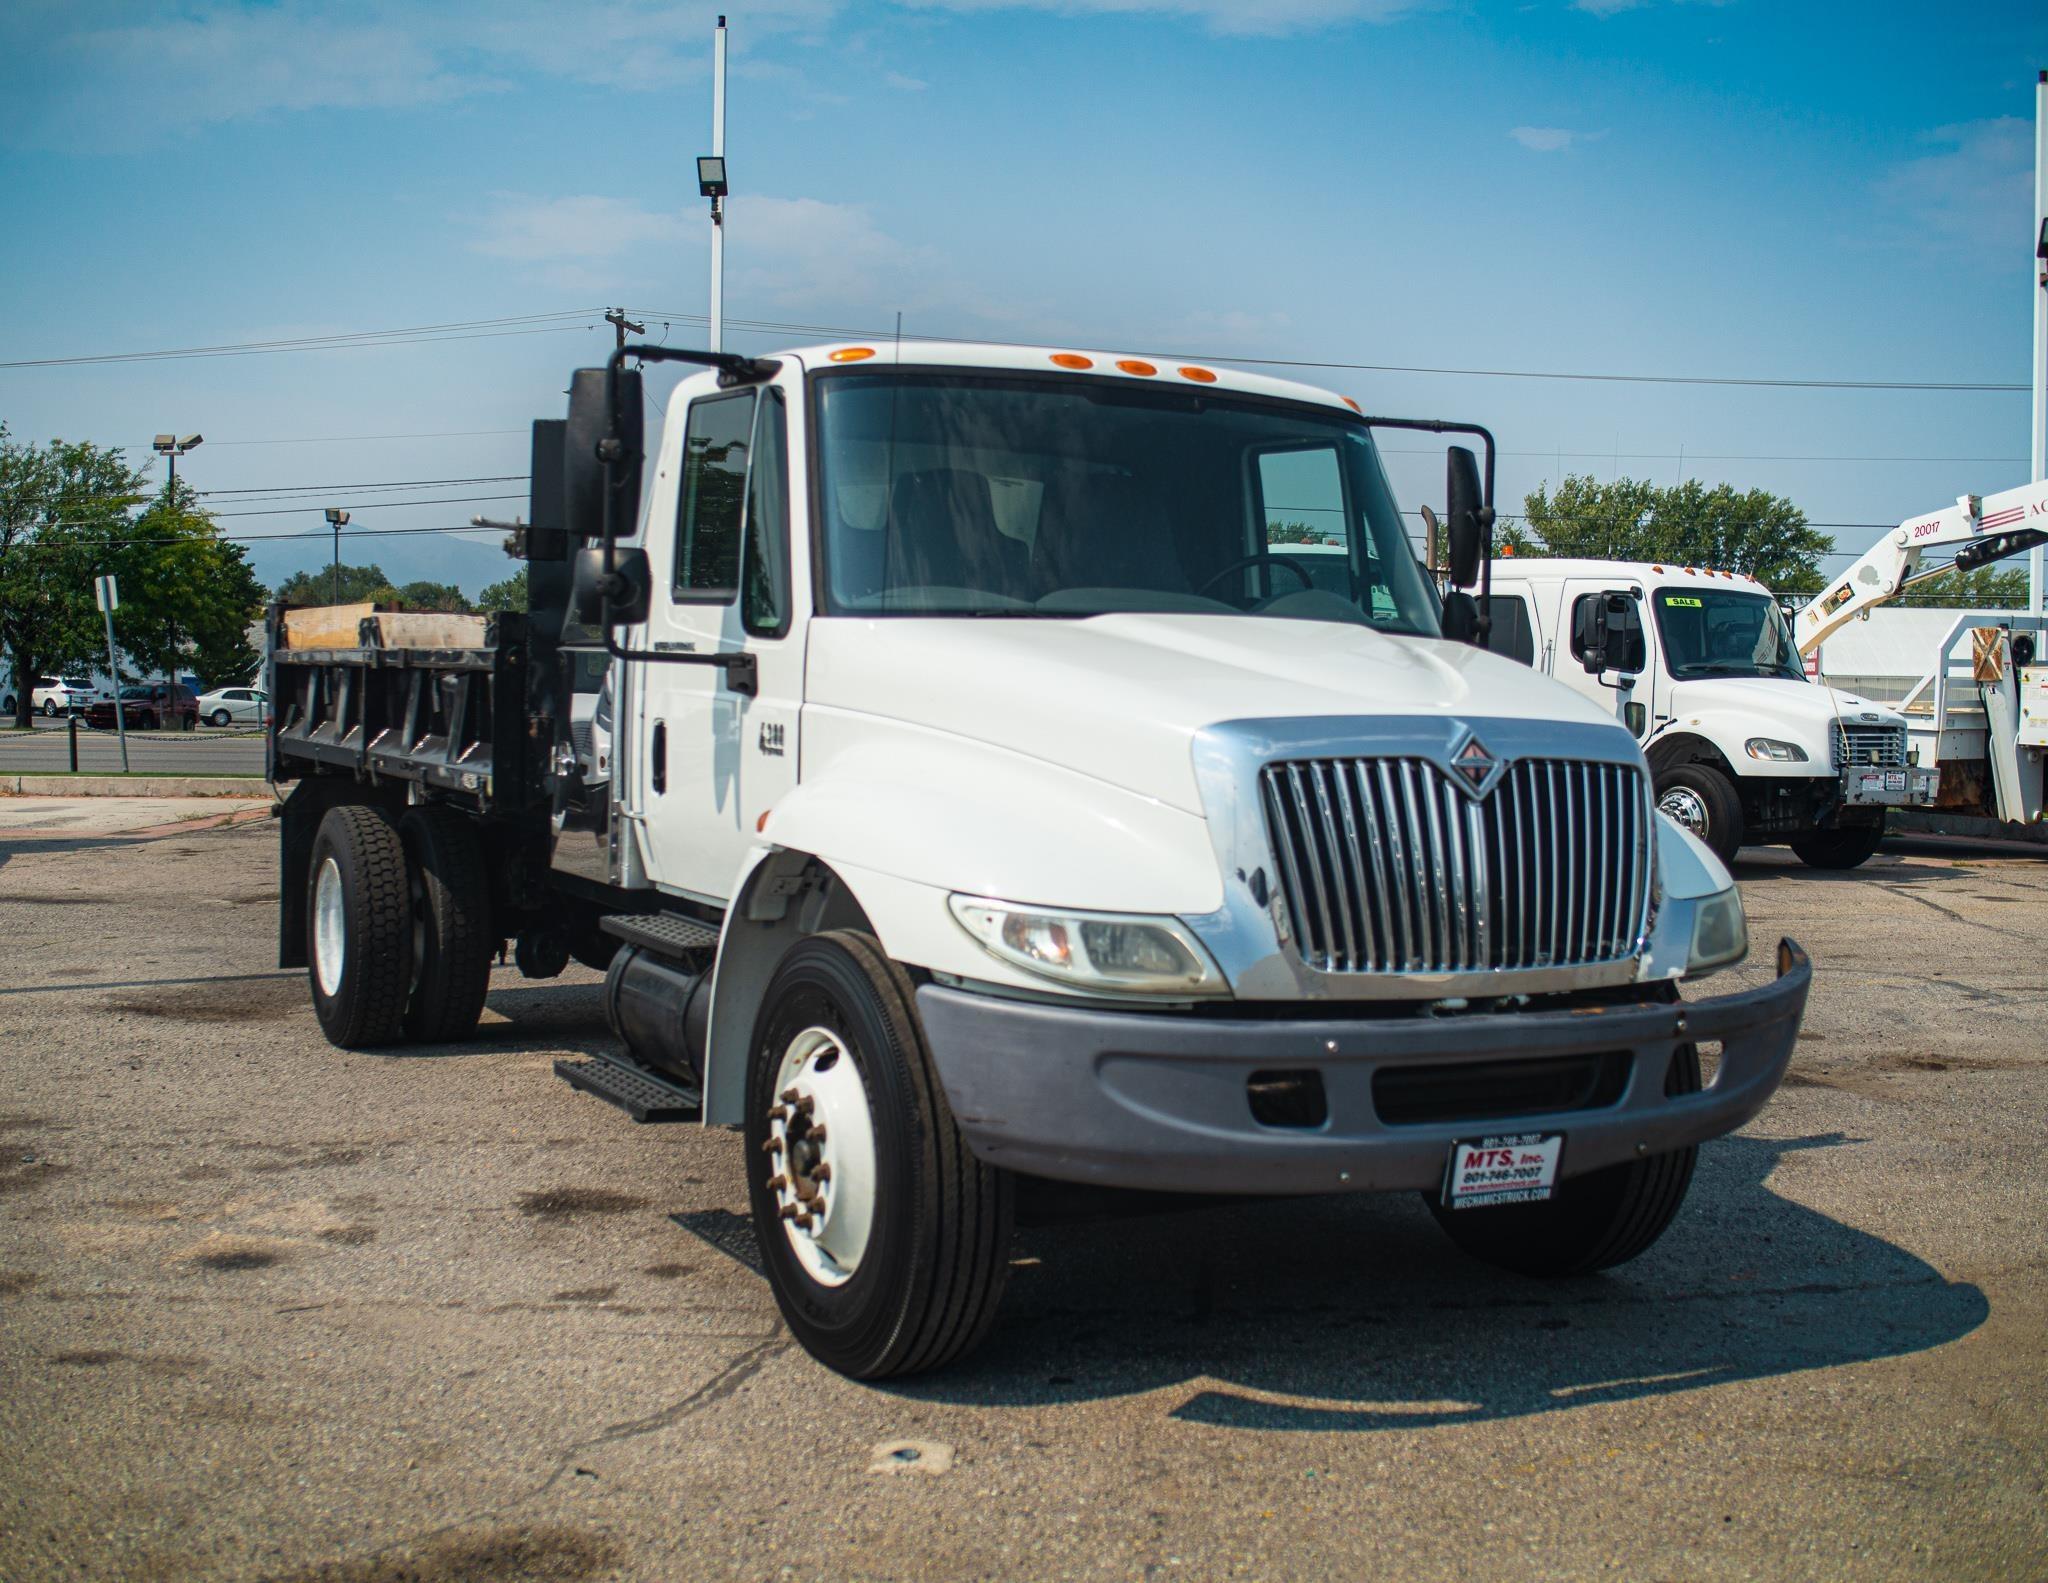 Used, 2007, INTERNATIONAL, 4000, Dump Truck